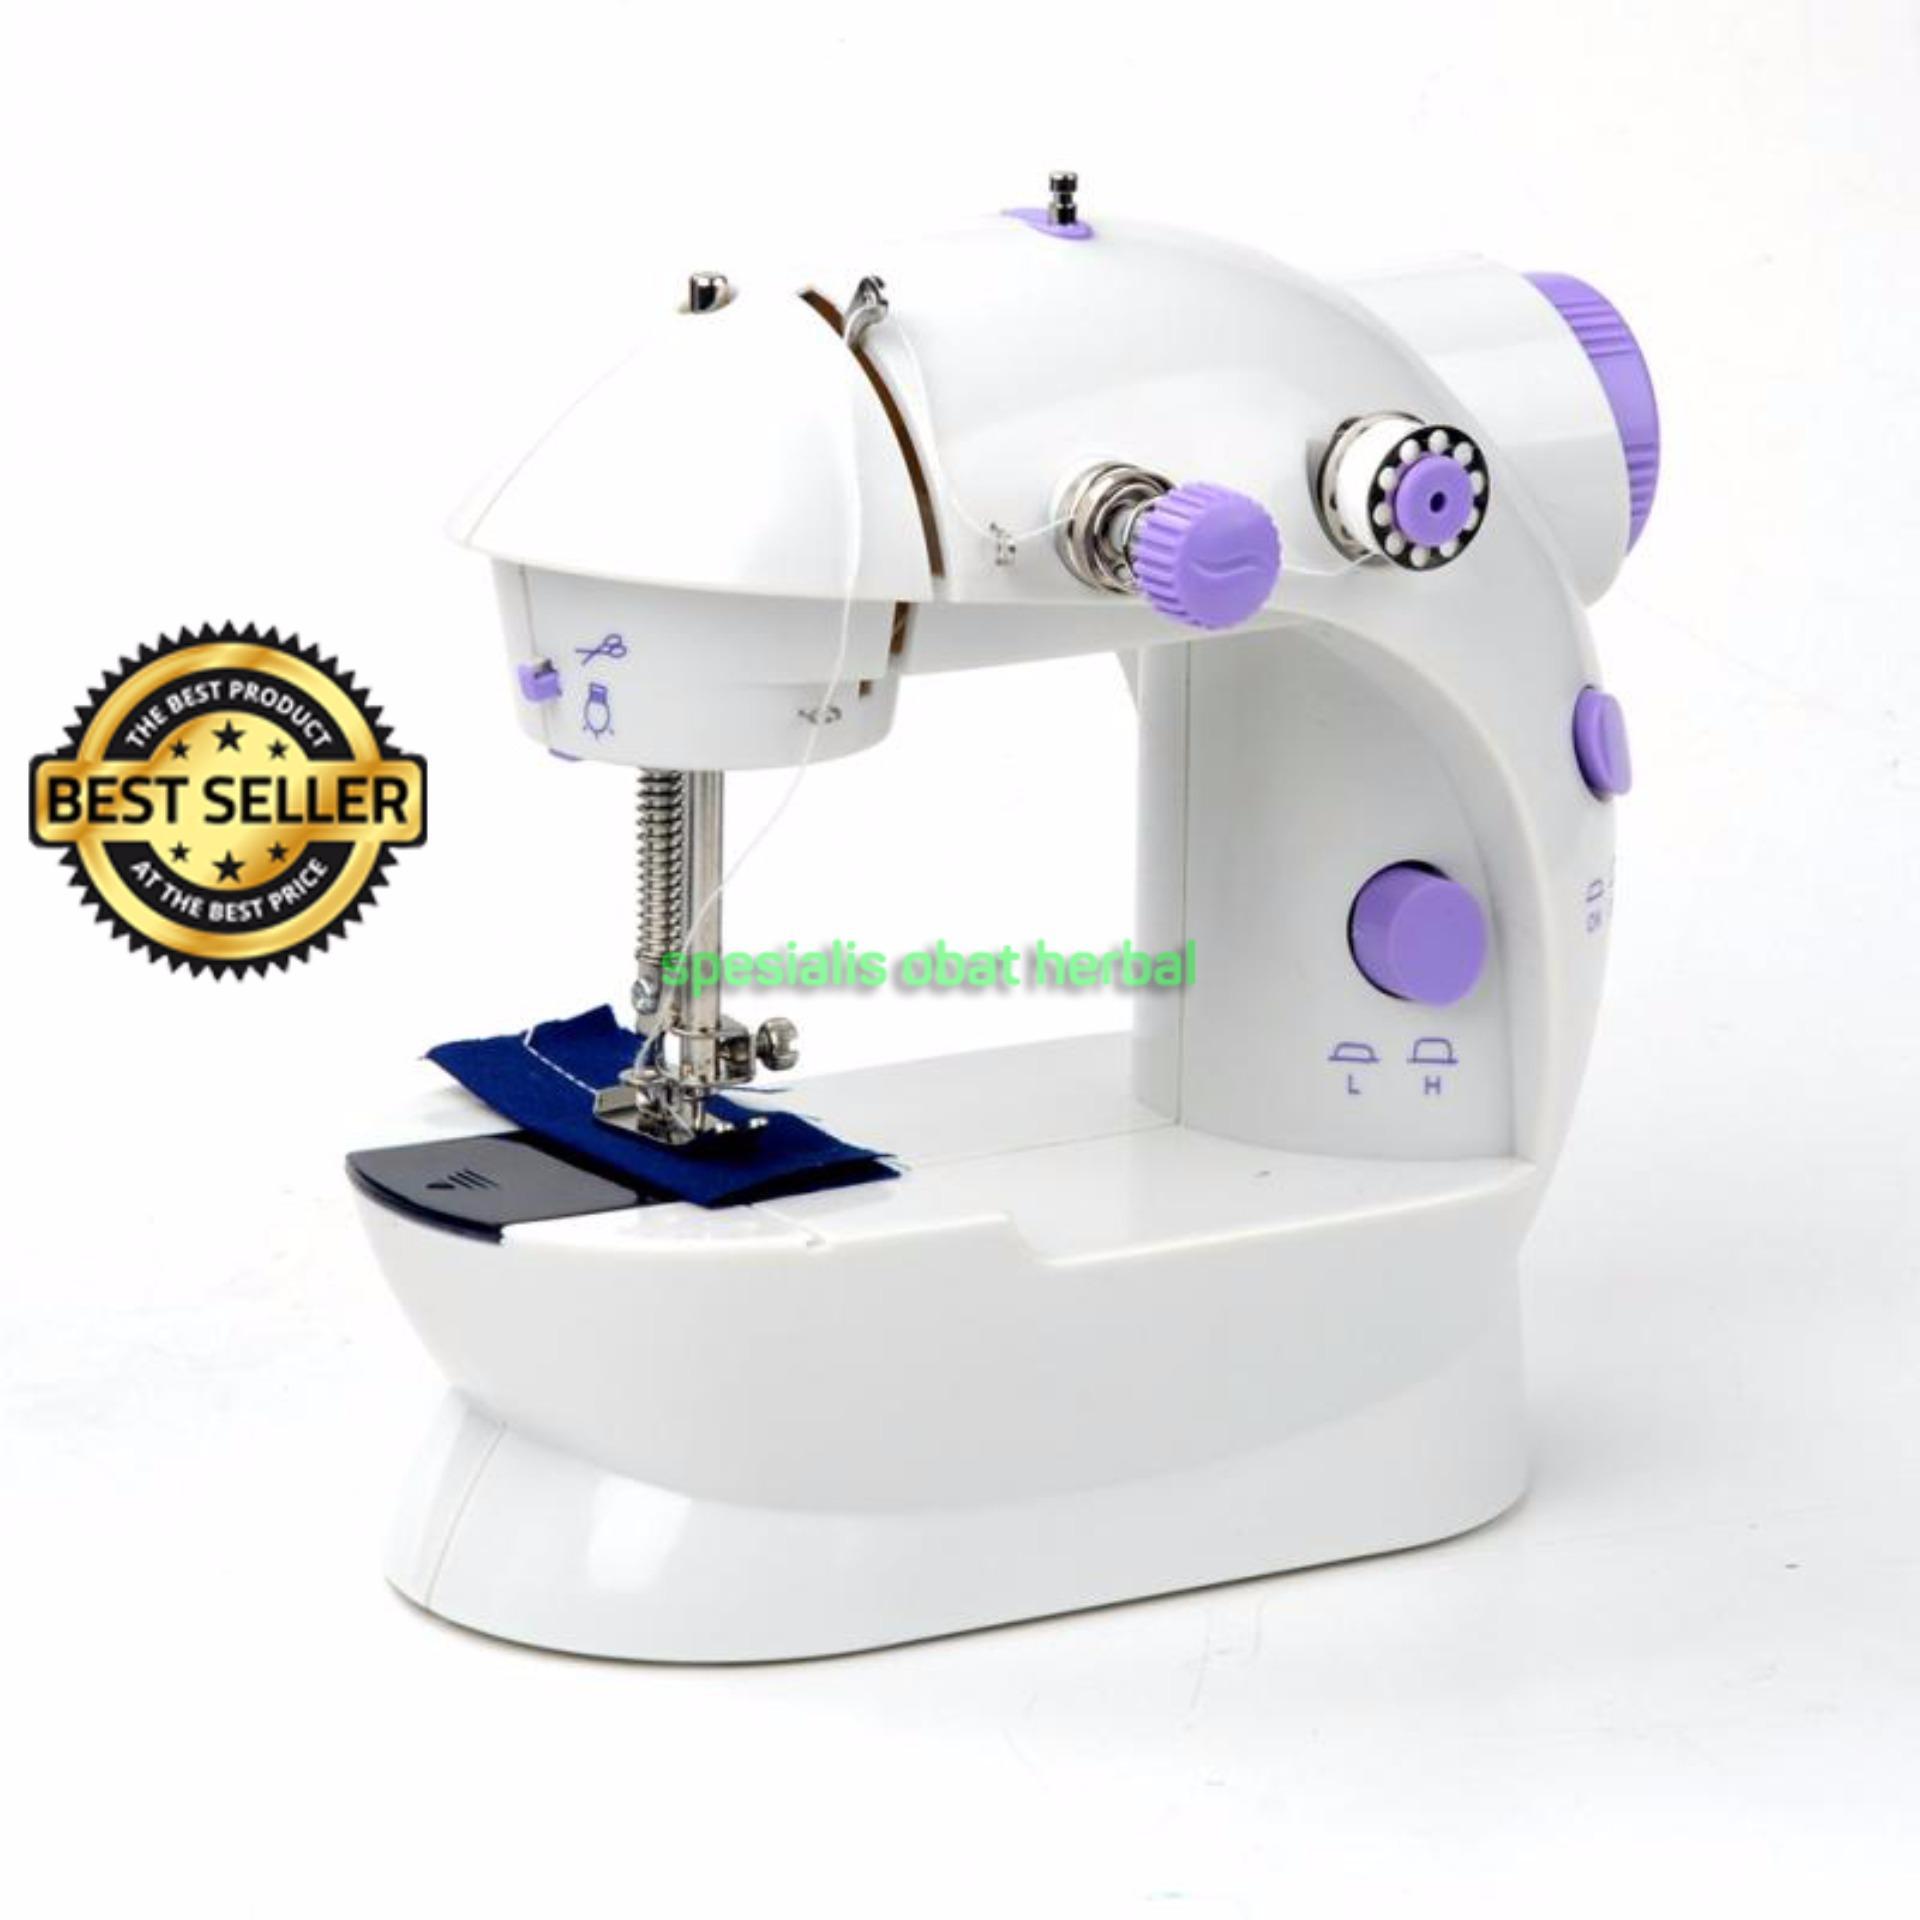 Paling Laku Mesin Jahit Portable Mini Sewing Machine Random Brother Ja1450nt Ja 1450nt Led Serbaguna Gt 202gt202